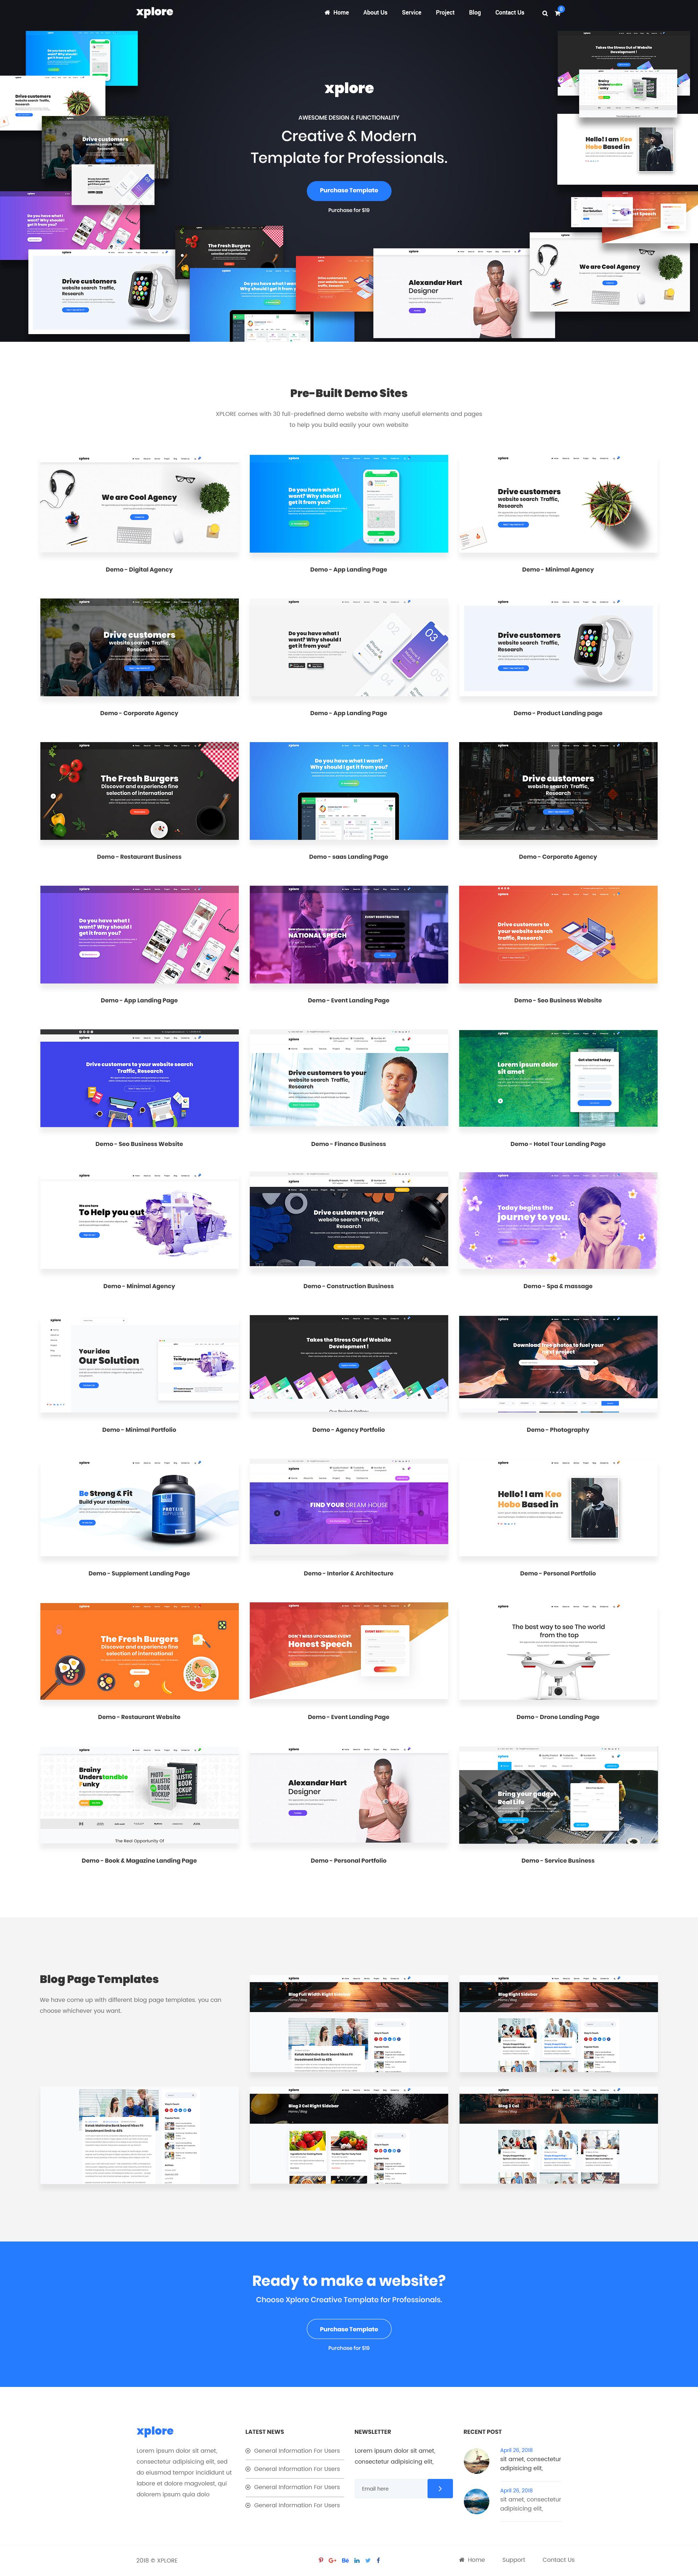 Xplore multipurpose website business psd template by shohag4y image set01 demog maxwellsz